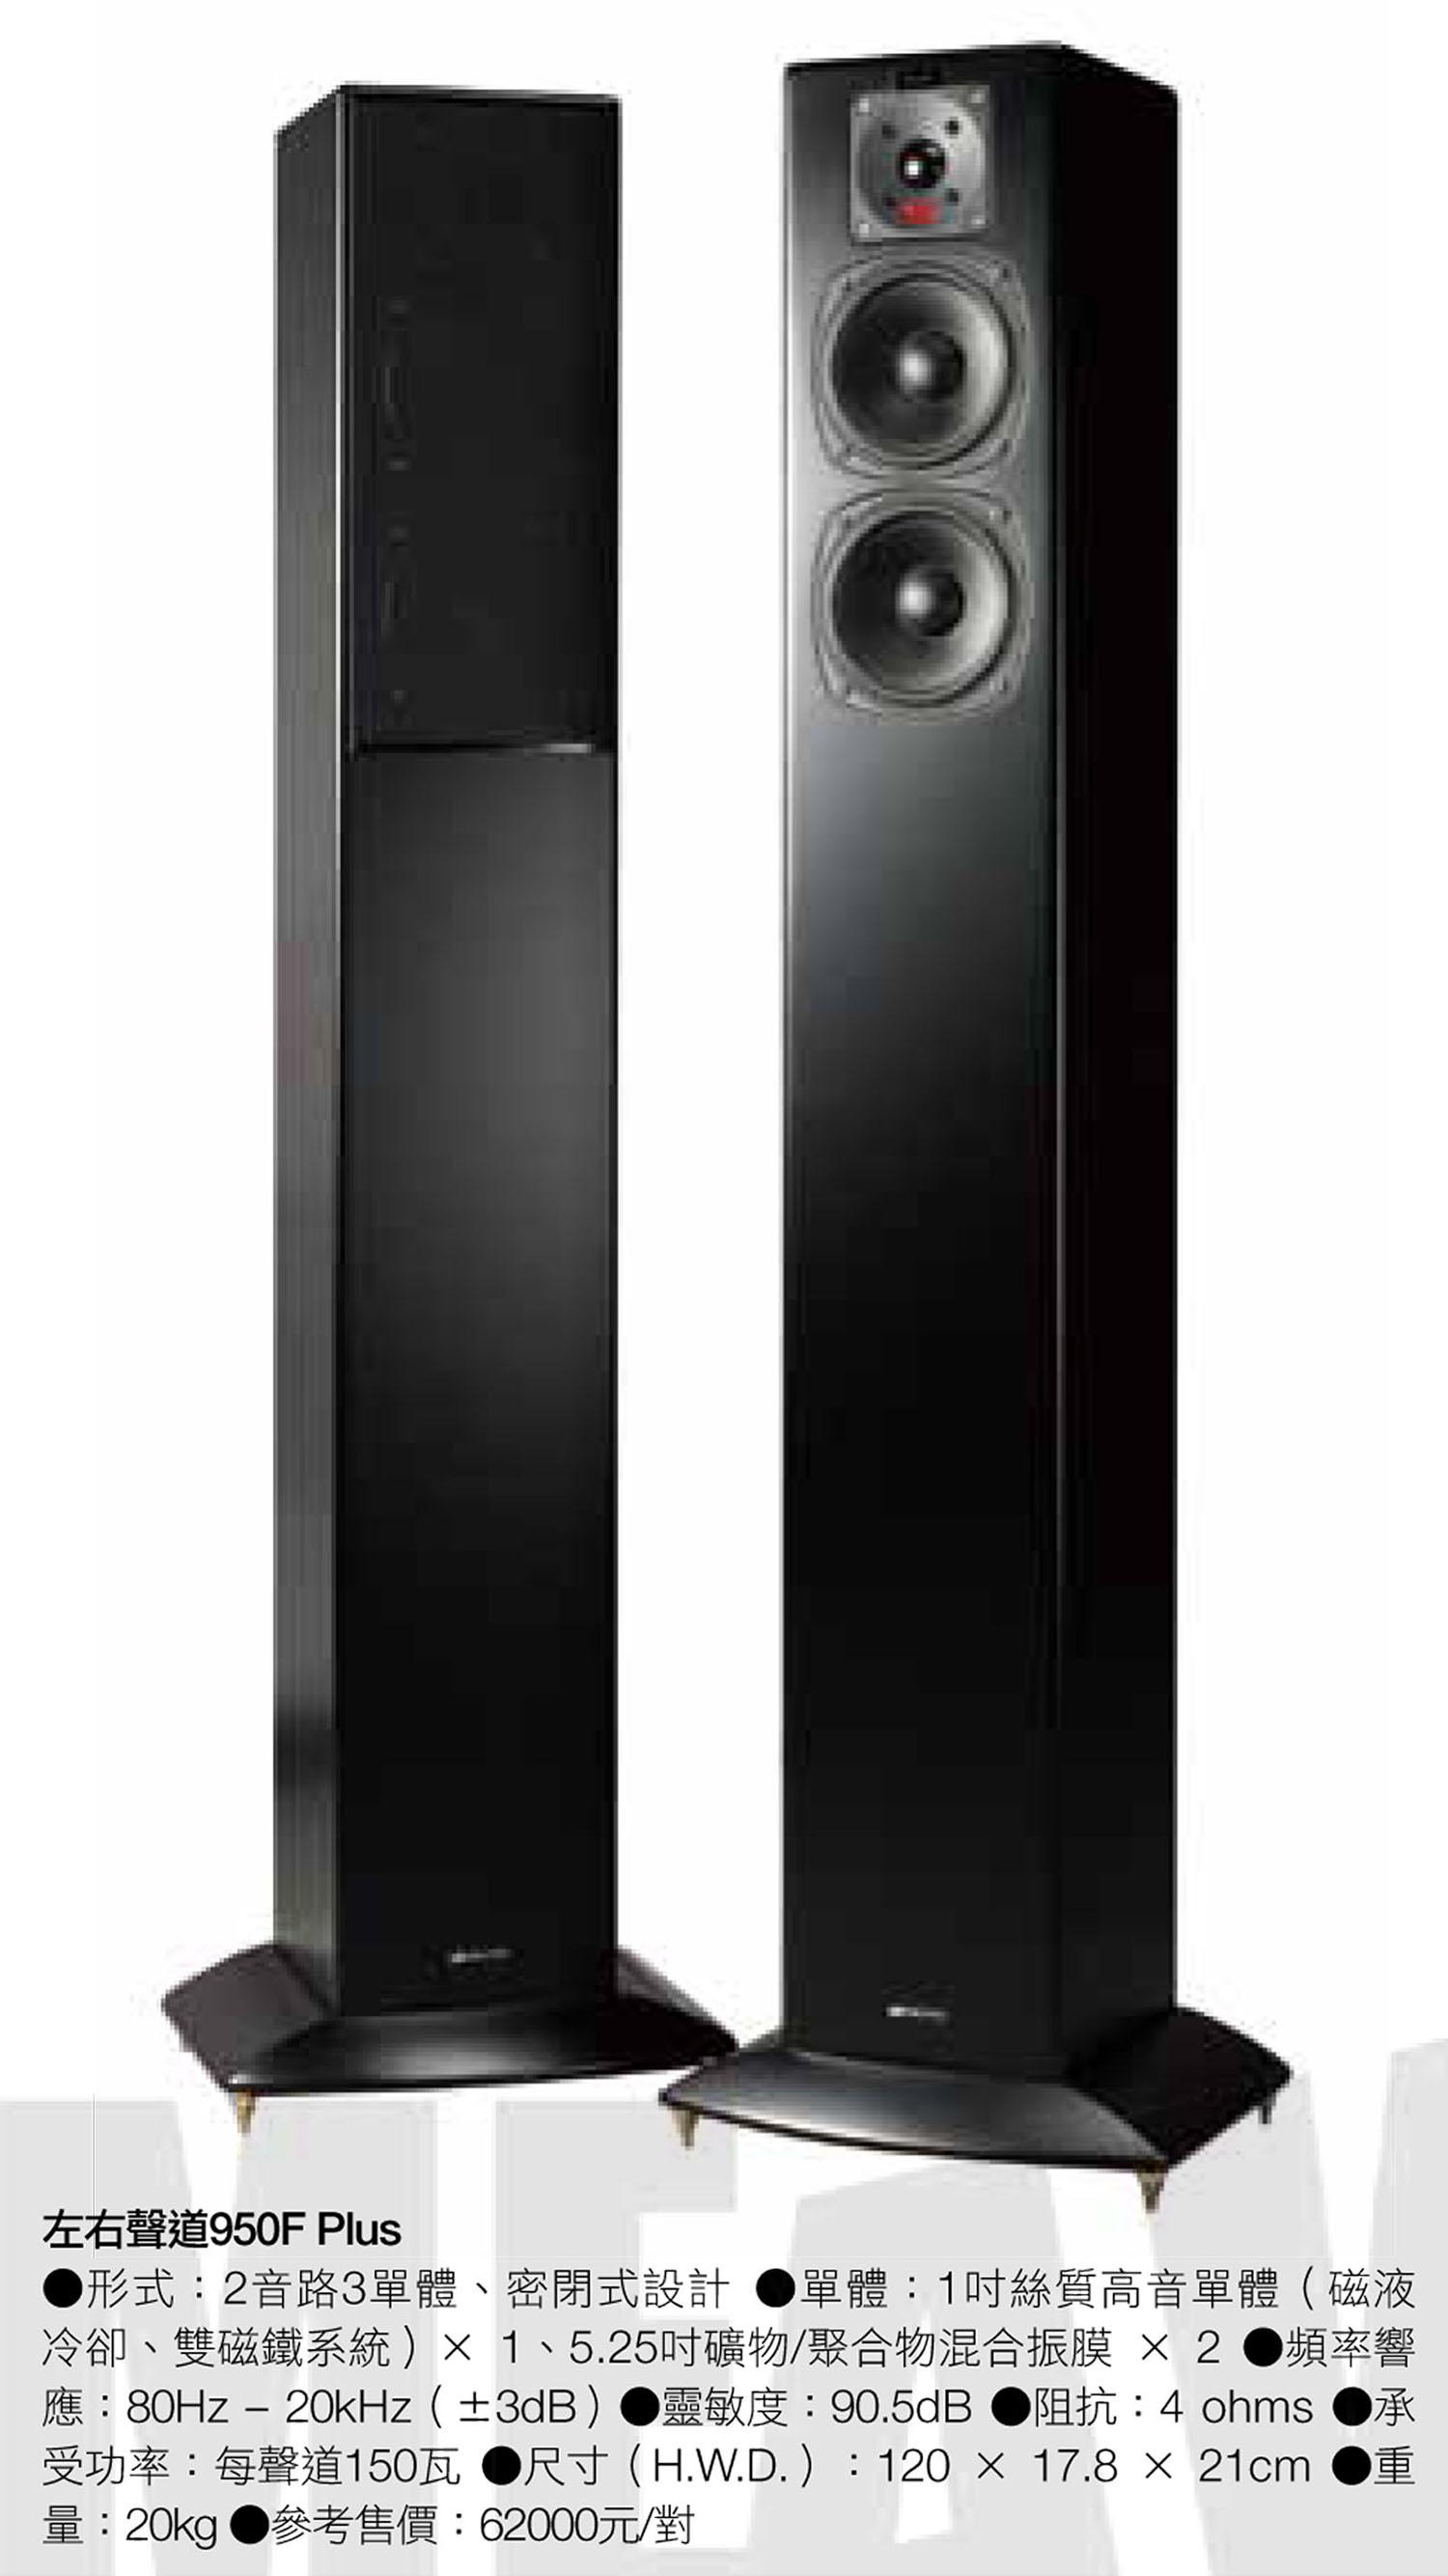 M&K SOUND 950F Plus 落地式喇叭規格